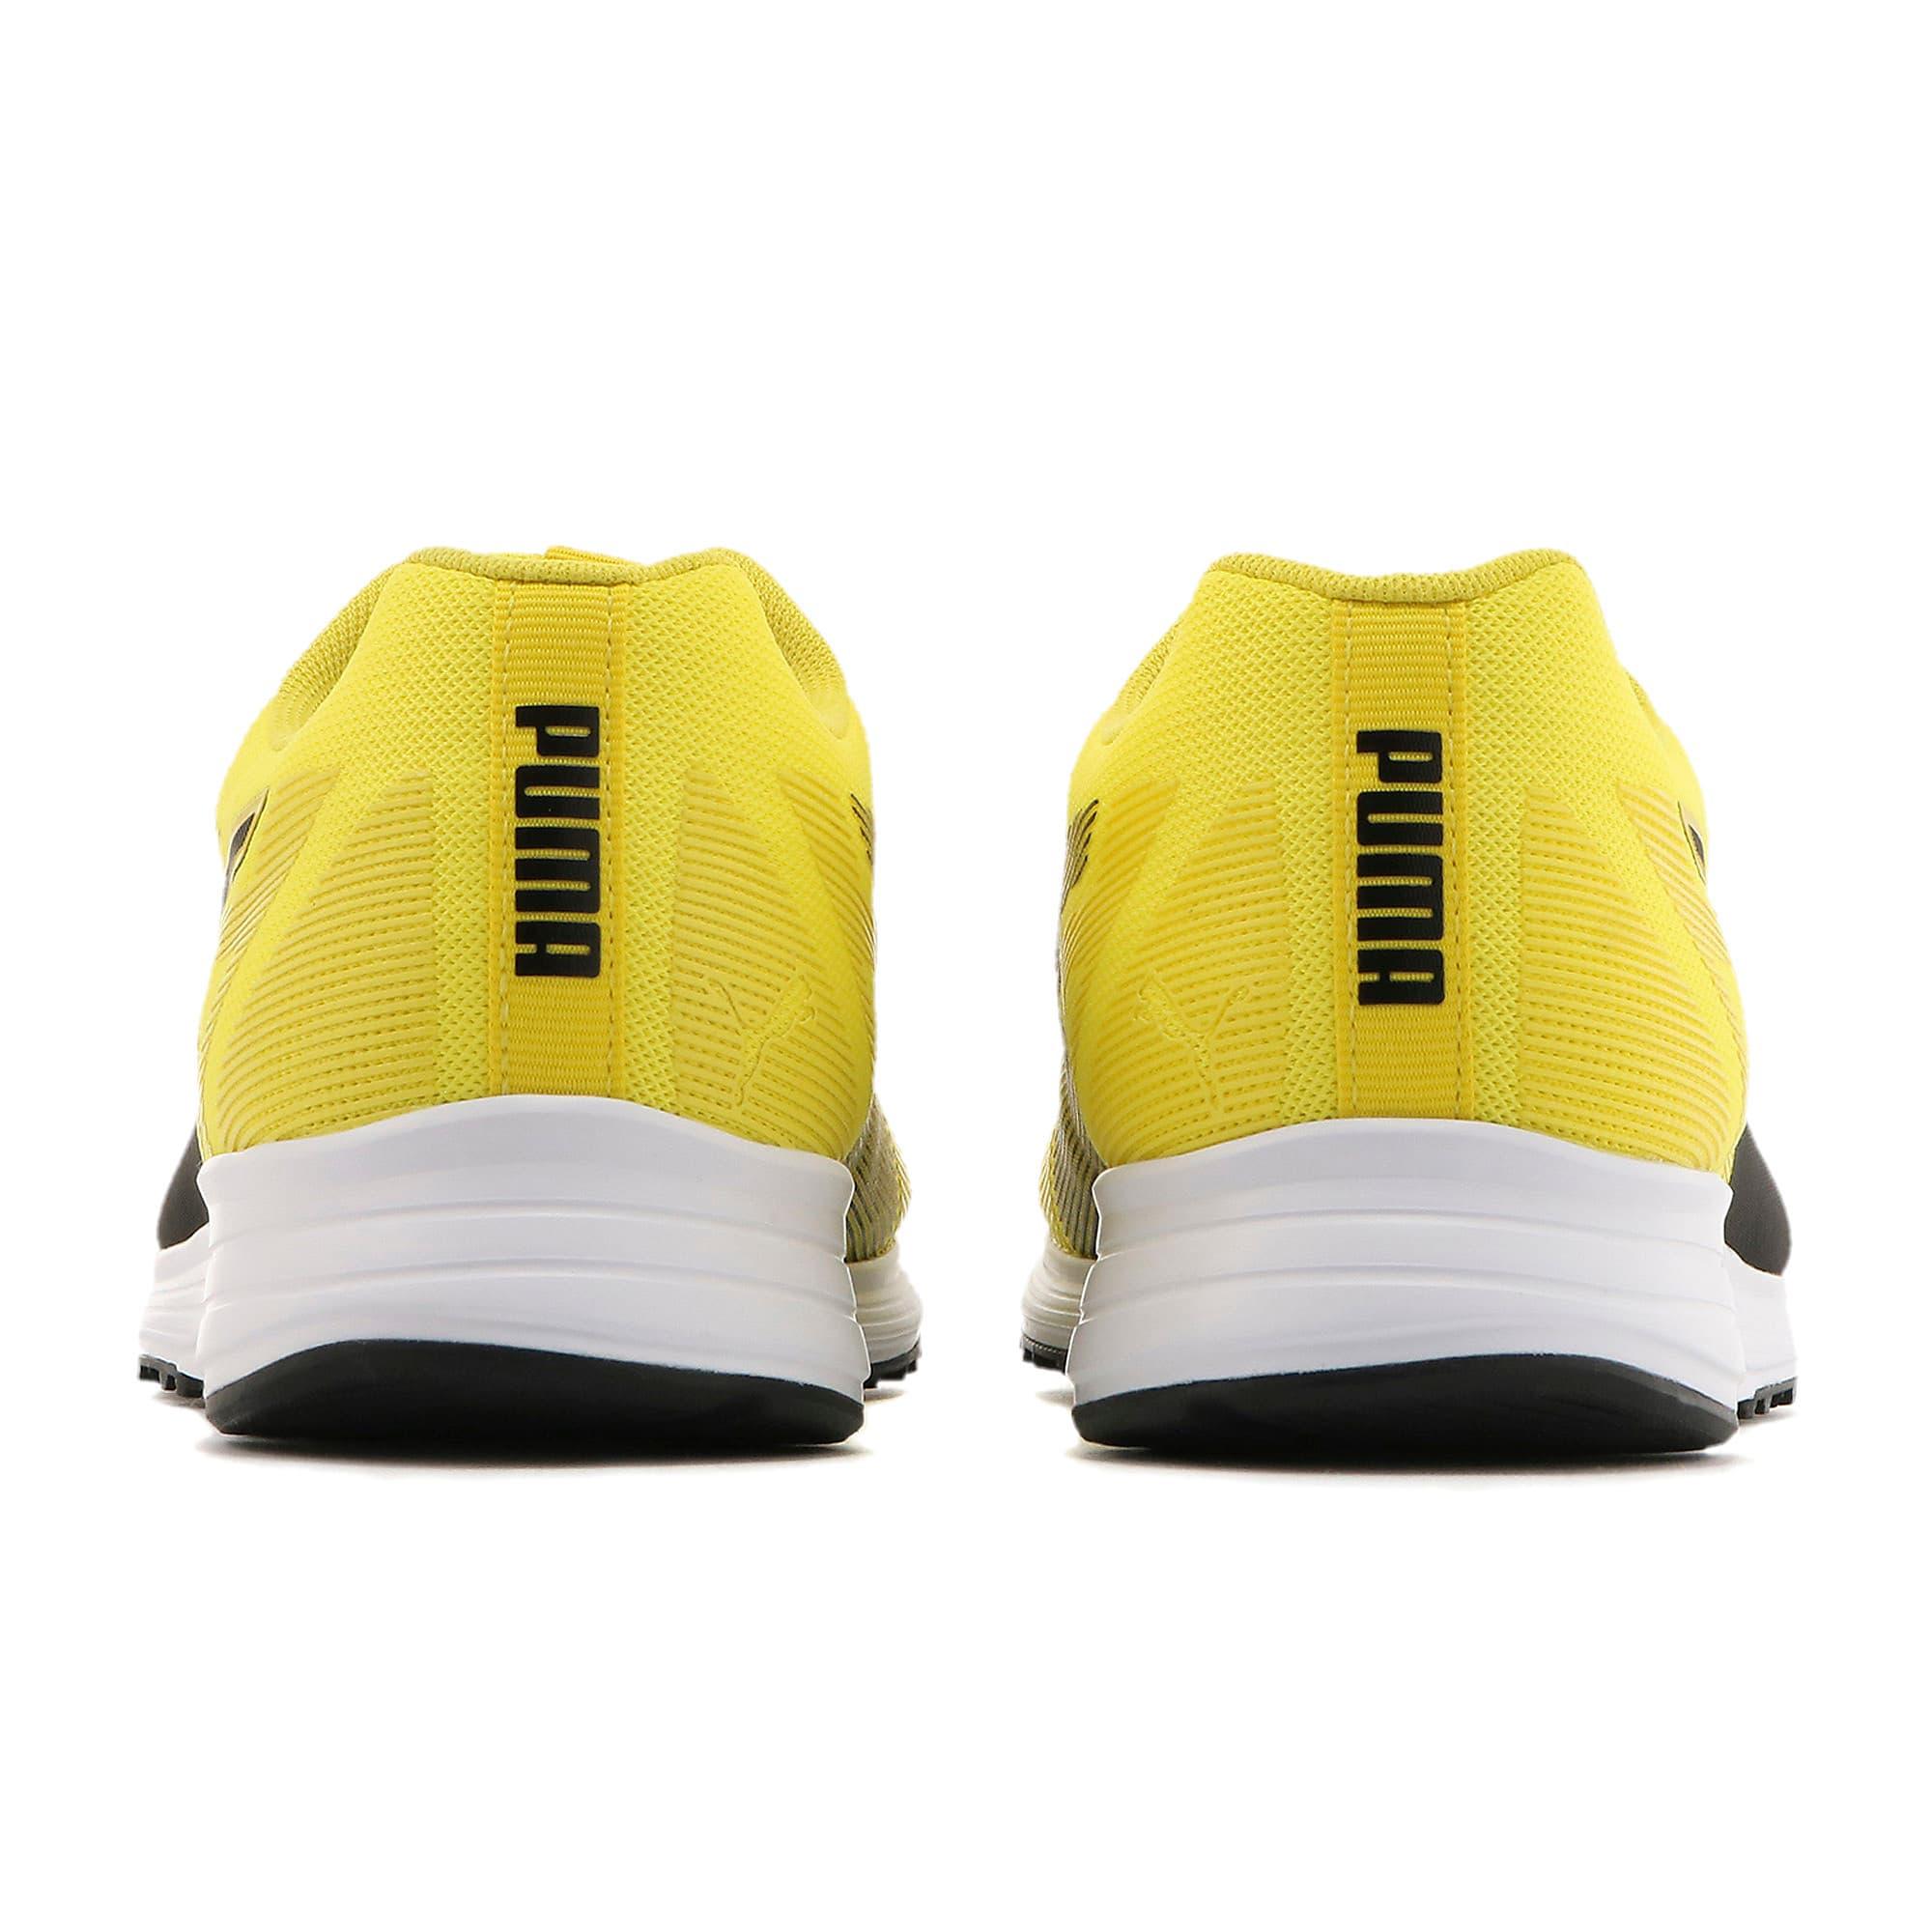 Thumbnail 3 of スピード ライト 2 ランニング, Blazing Yellow-Puma Black, medium-JPN